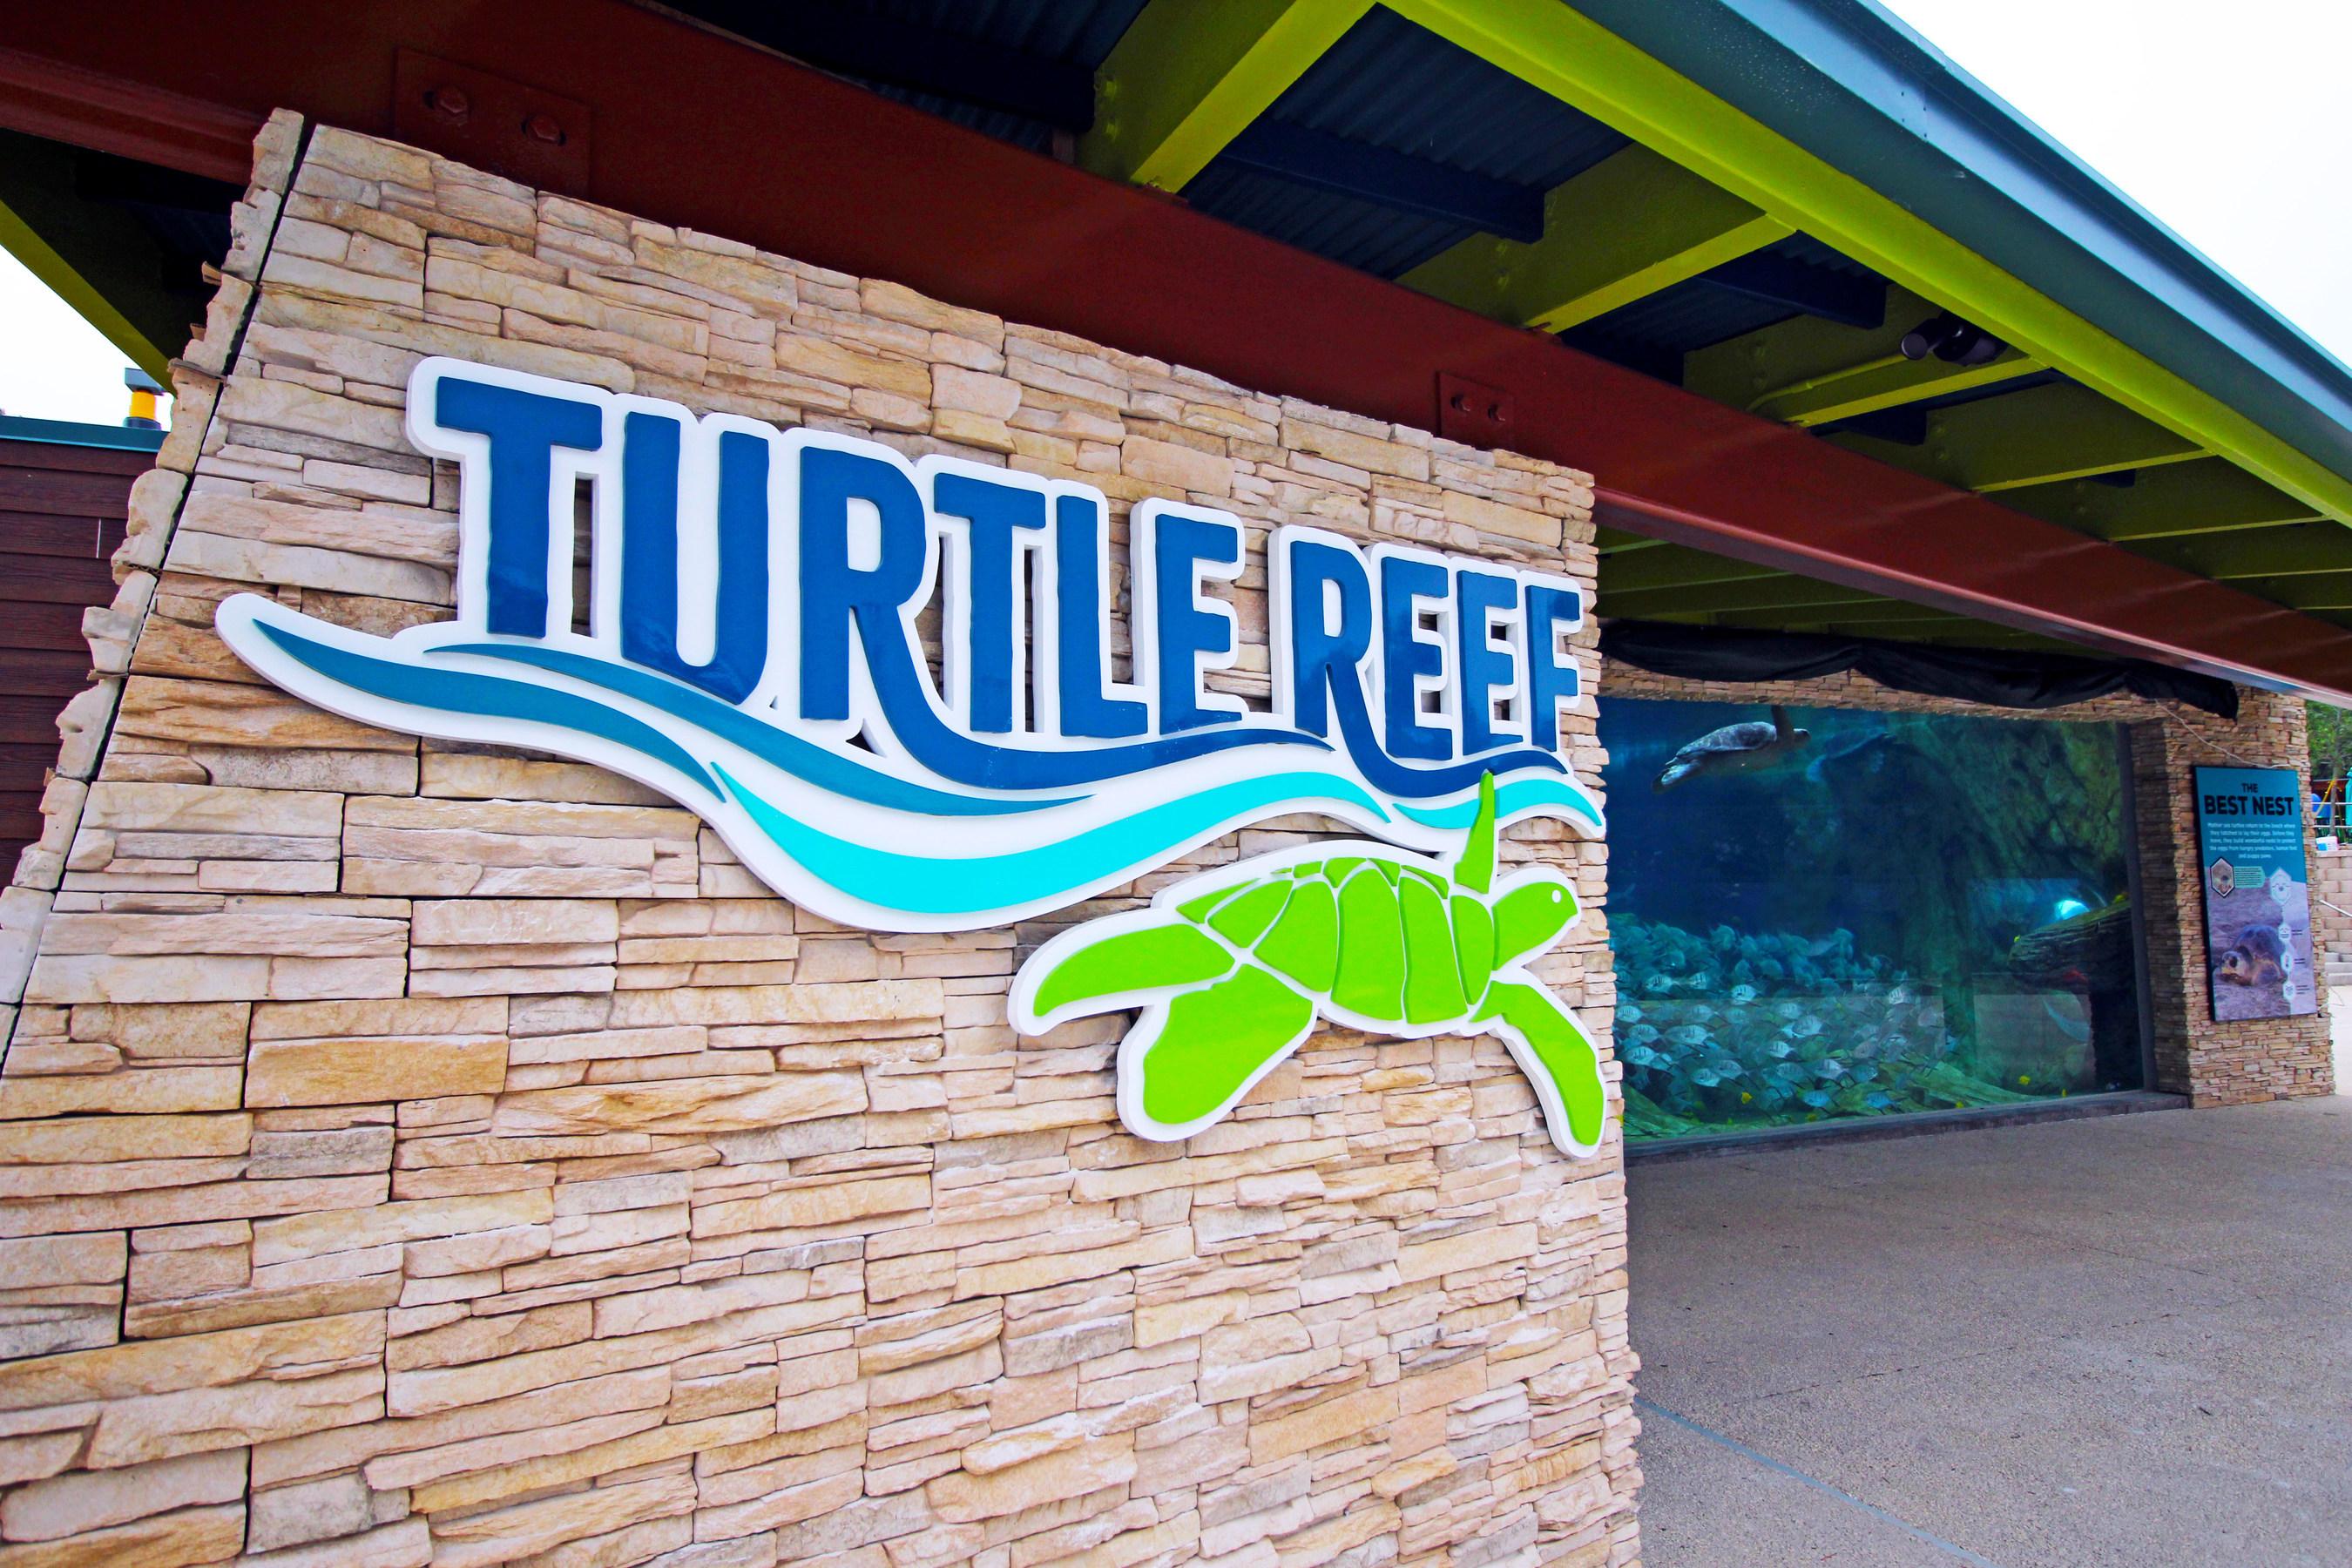 SeaWorld San Antonio Opens State-of-the-Art Turtle Reef ... on aquatica map, san diego map, disney's animal kingdom map, san antonio riverwalk map, zoo map, michigan adventure map, discovery cove map, universal map, islands of adventure map, knotts berry farm map, busch gardens map, cedar point map, disney blizzard beach map, disneyland map,